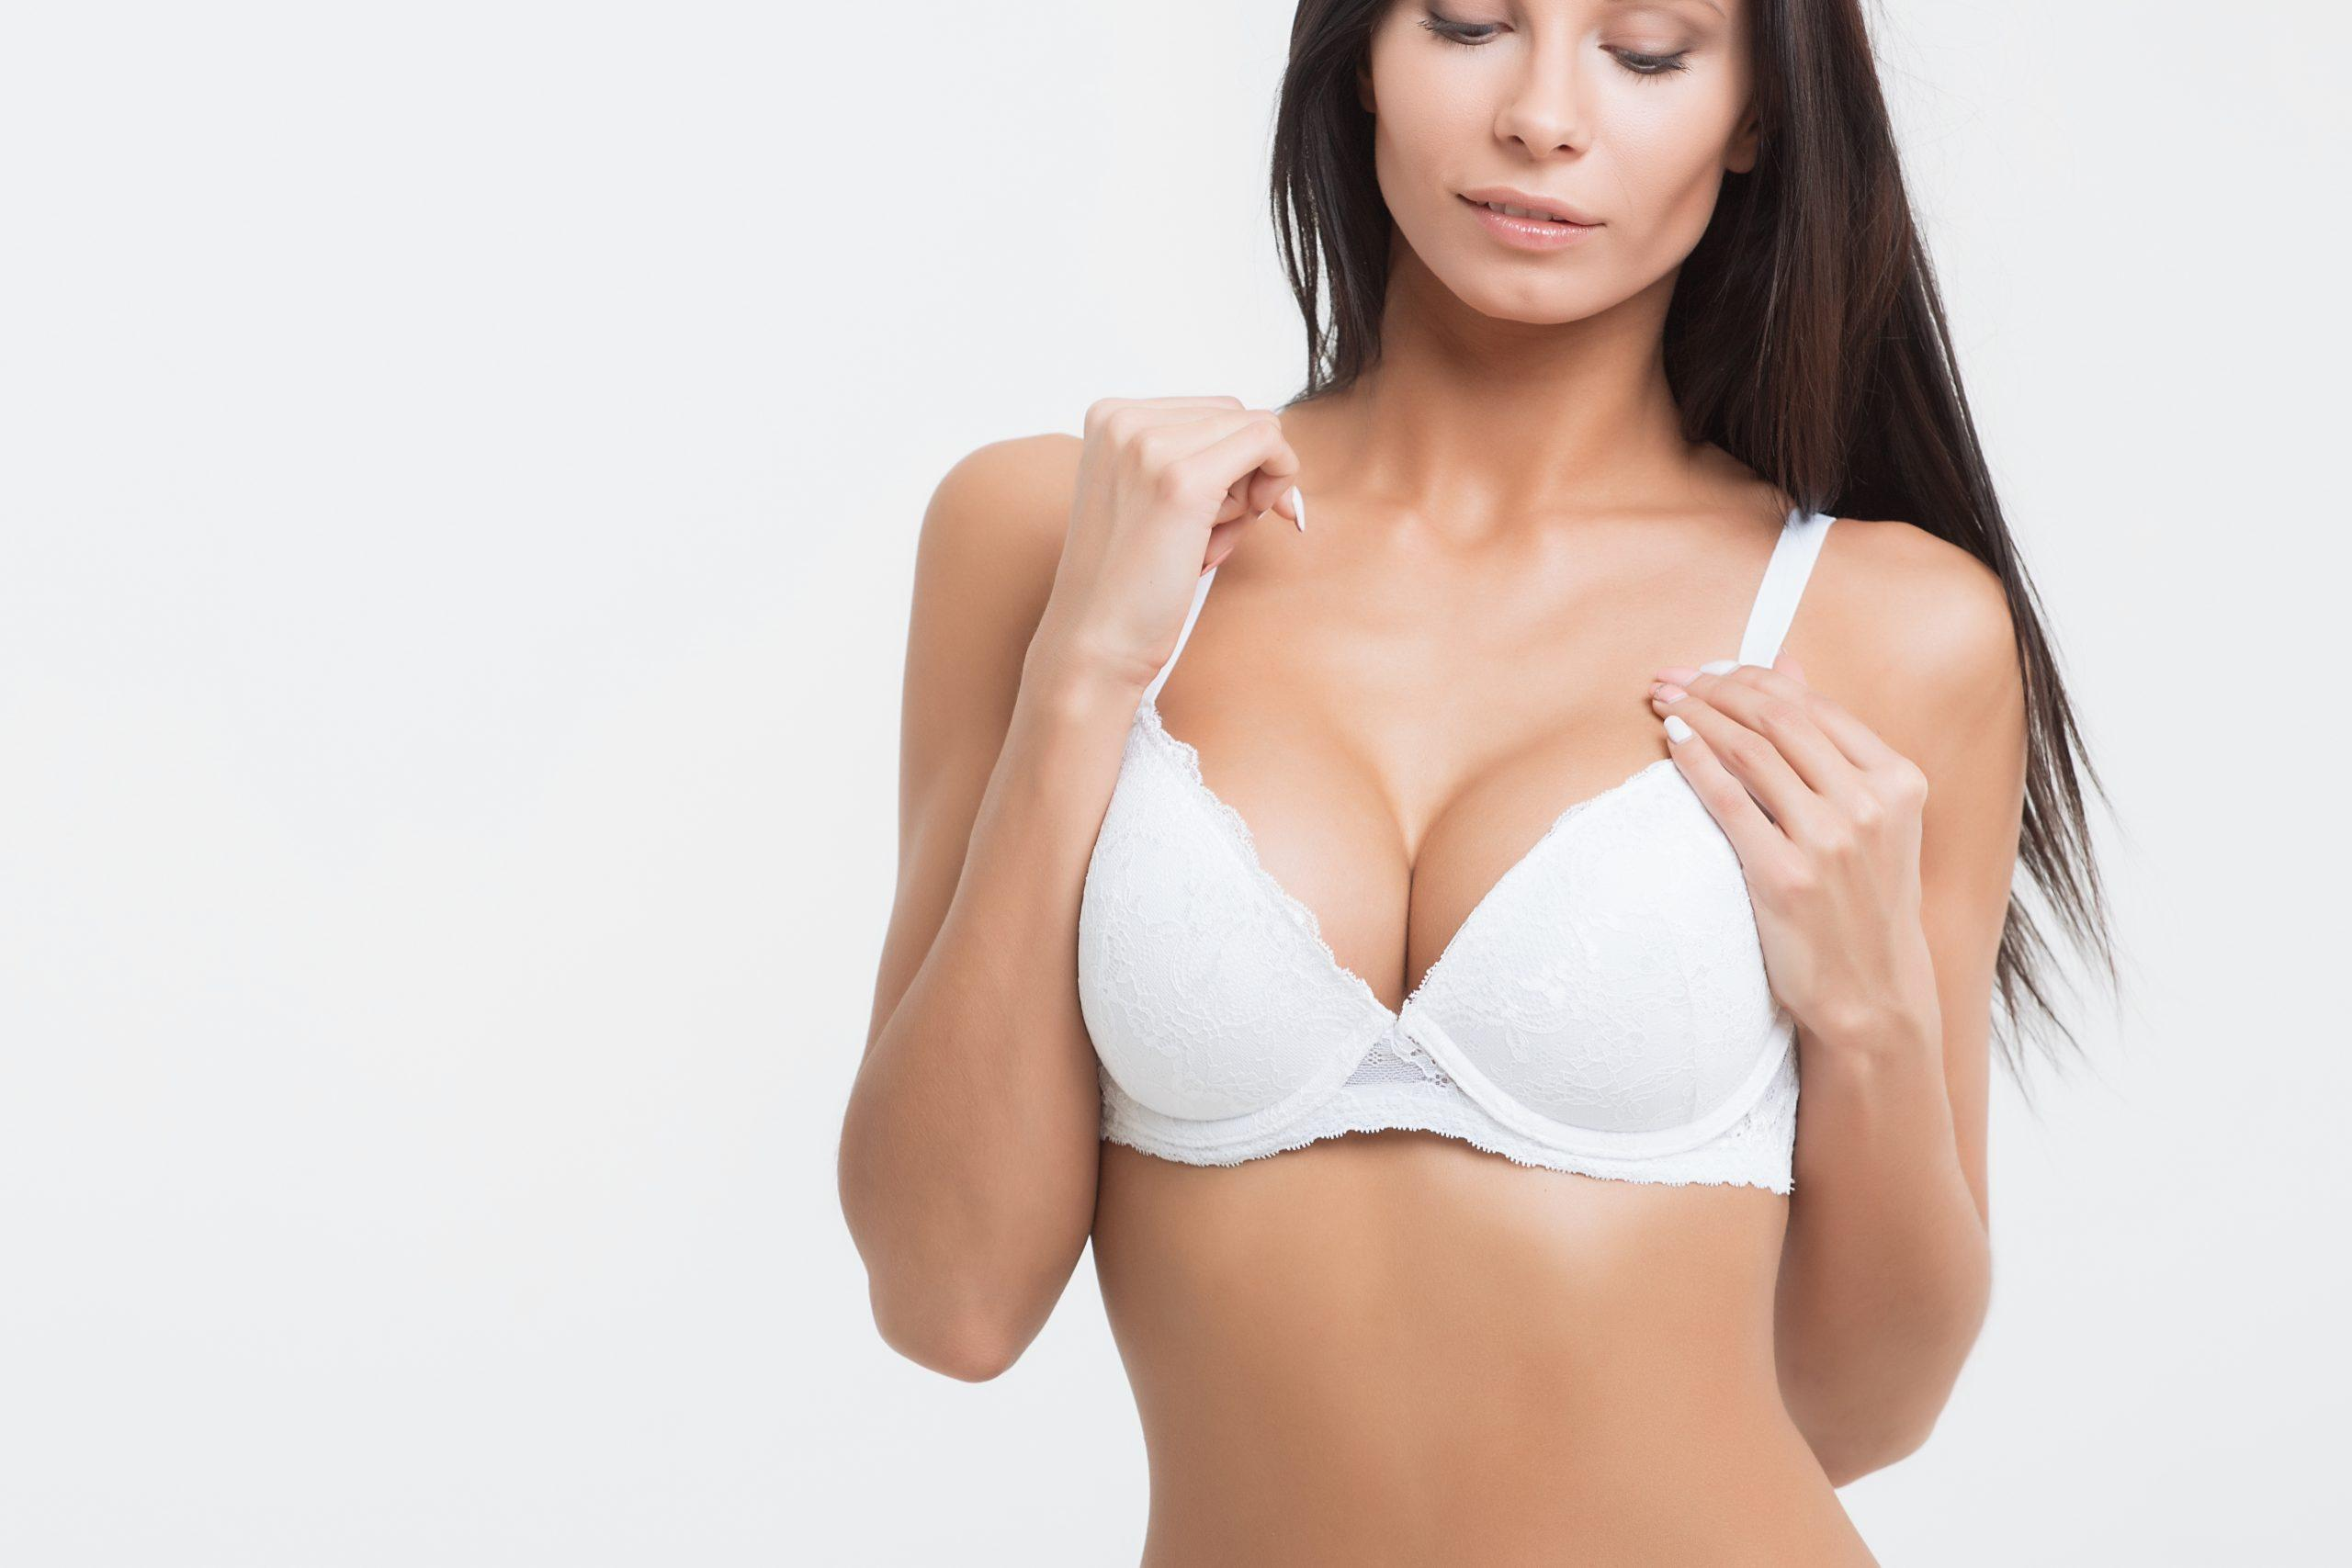 Kapselfibrose Bruststraffung brustvergrößerung Bruststraffung